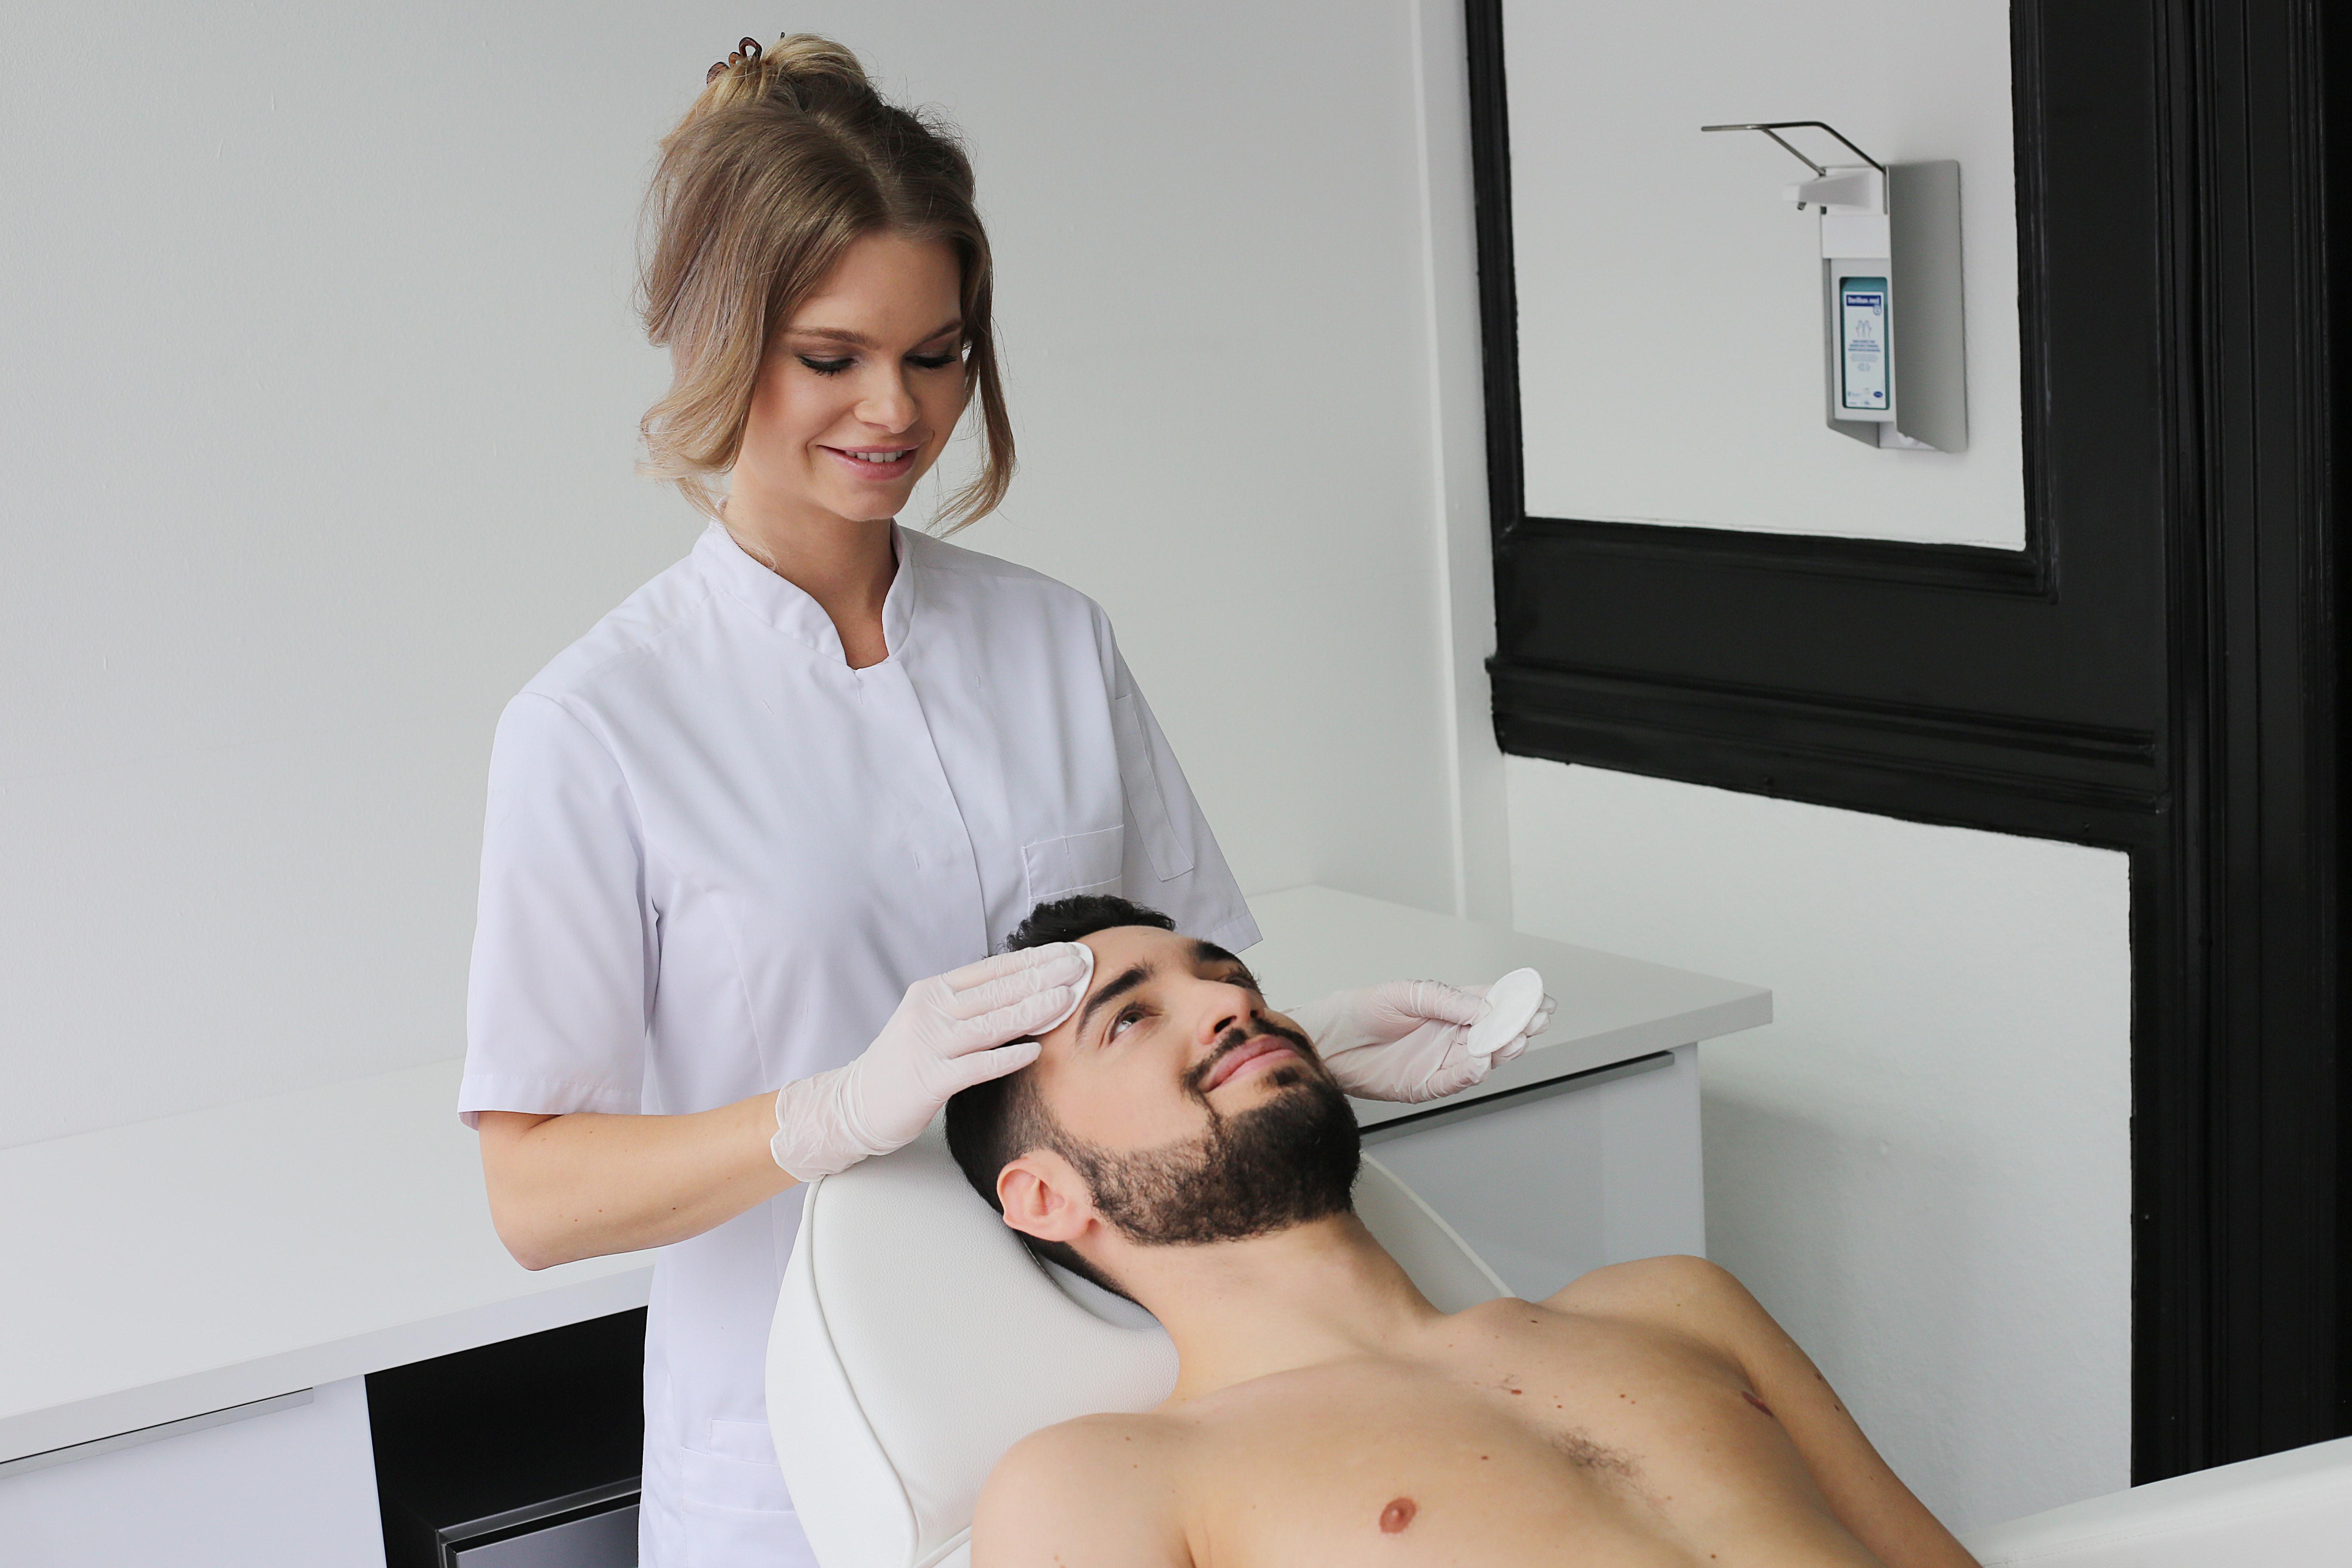 Egale huid refleqt clinic JPG